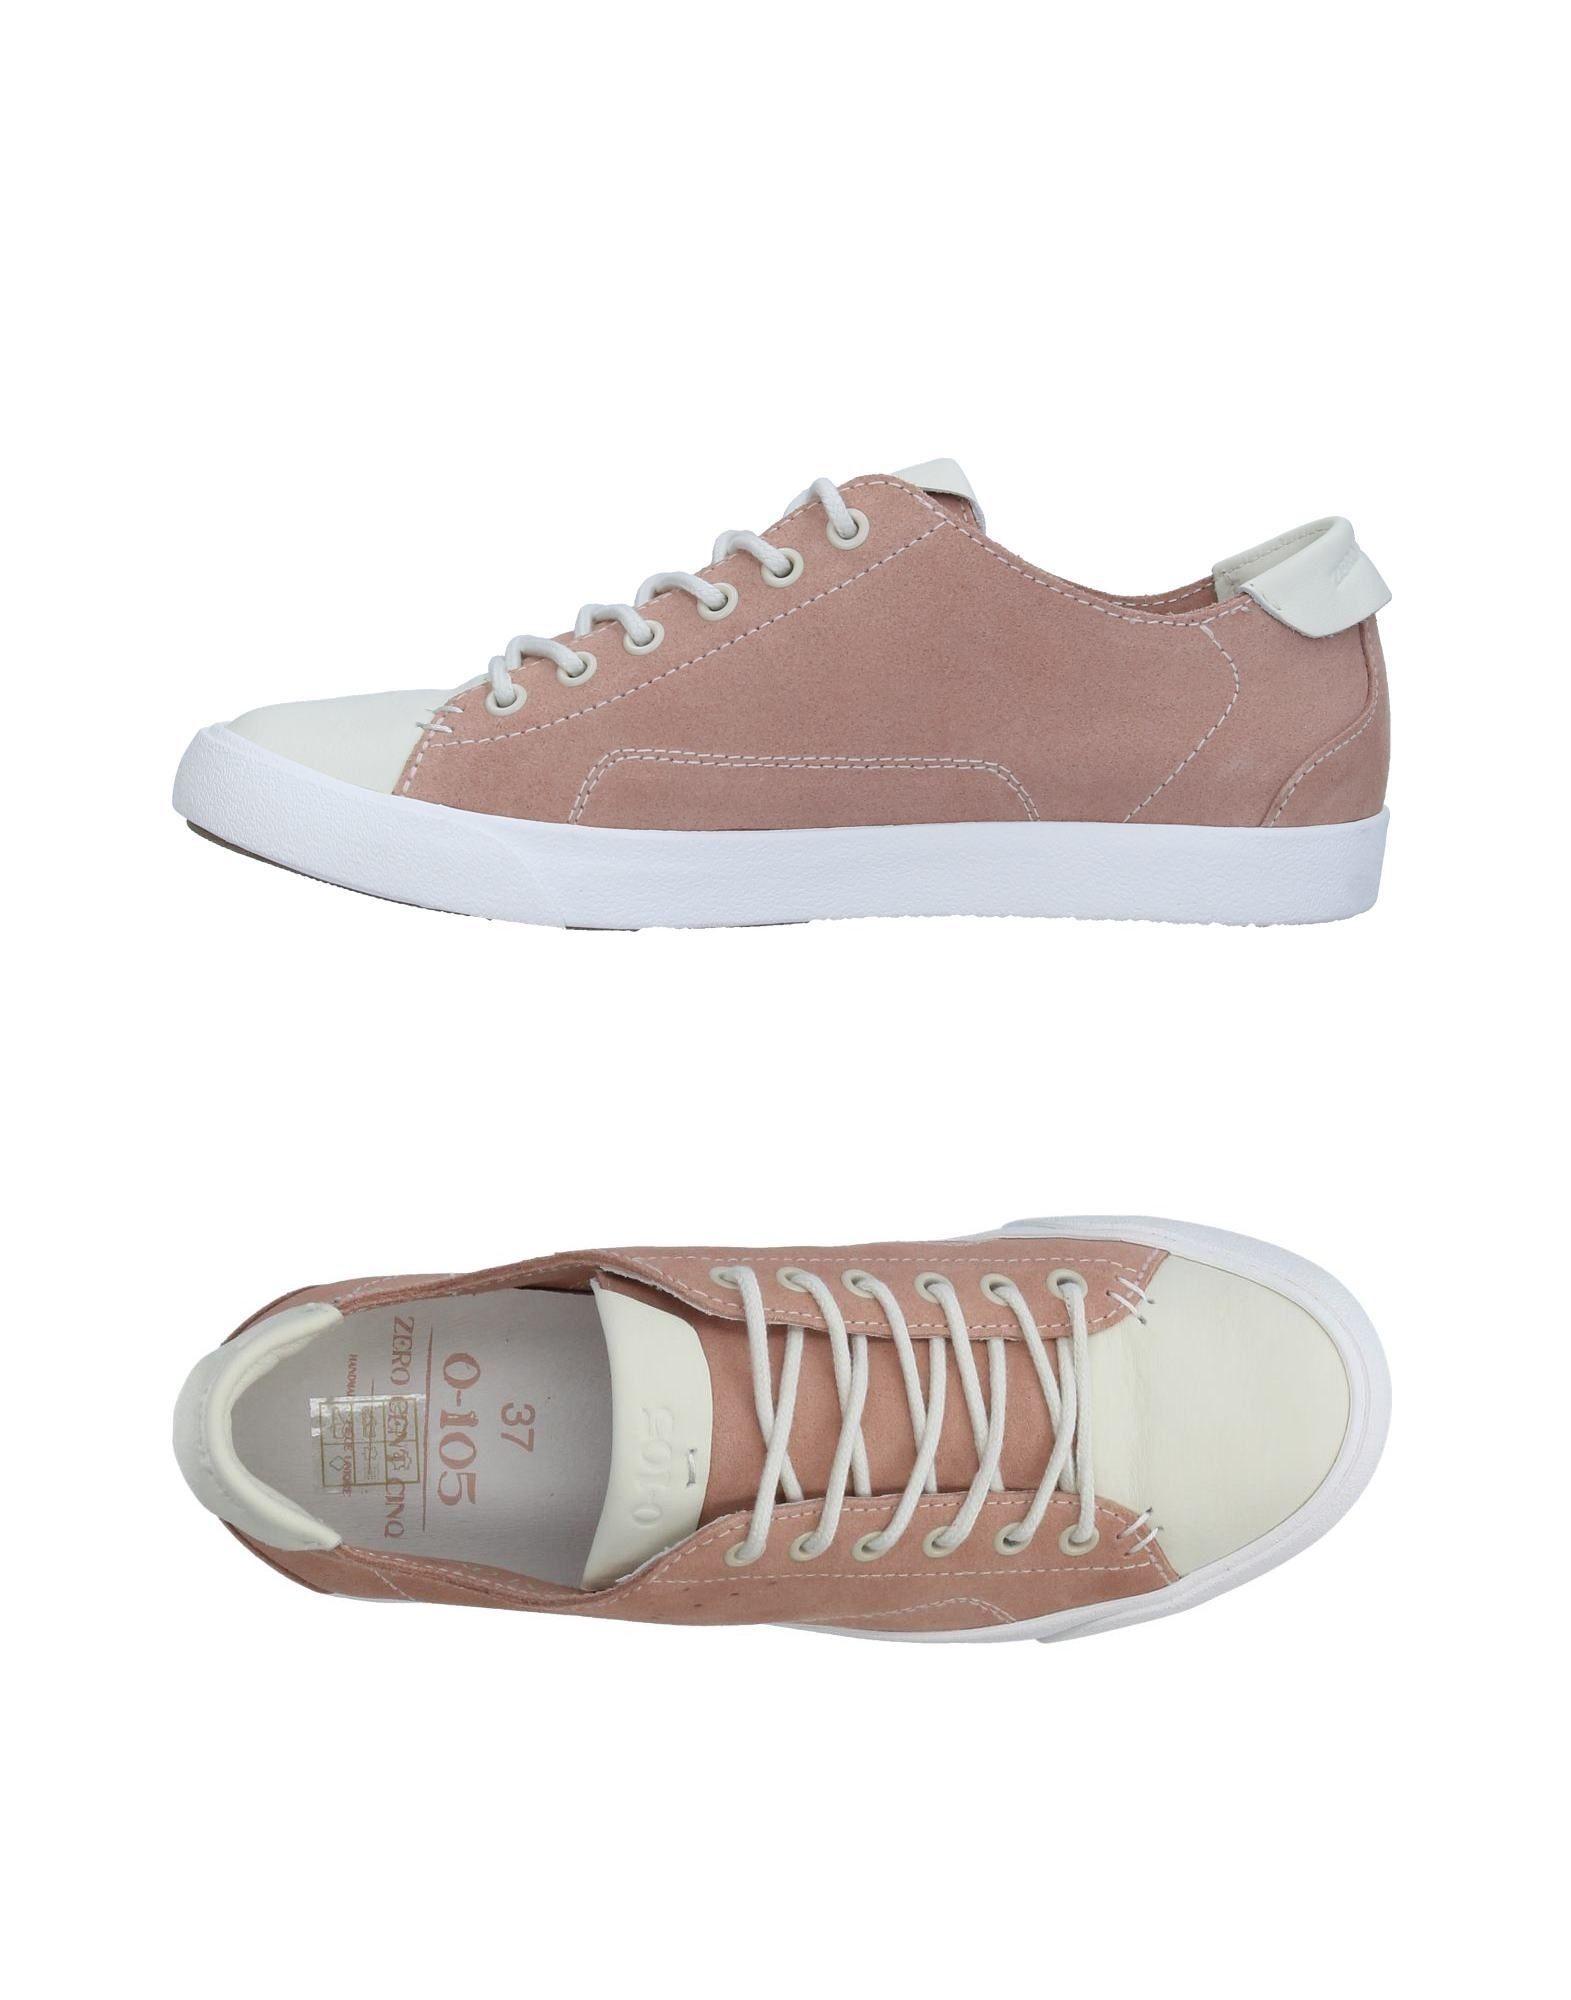 Sneakers 0-105 Zero Cent Cinq Donna - 11335129GT